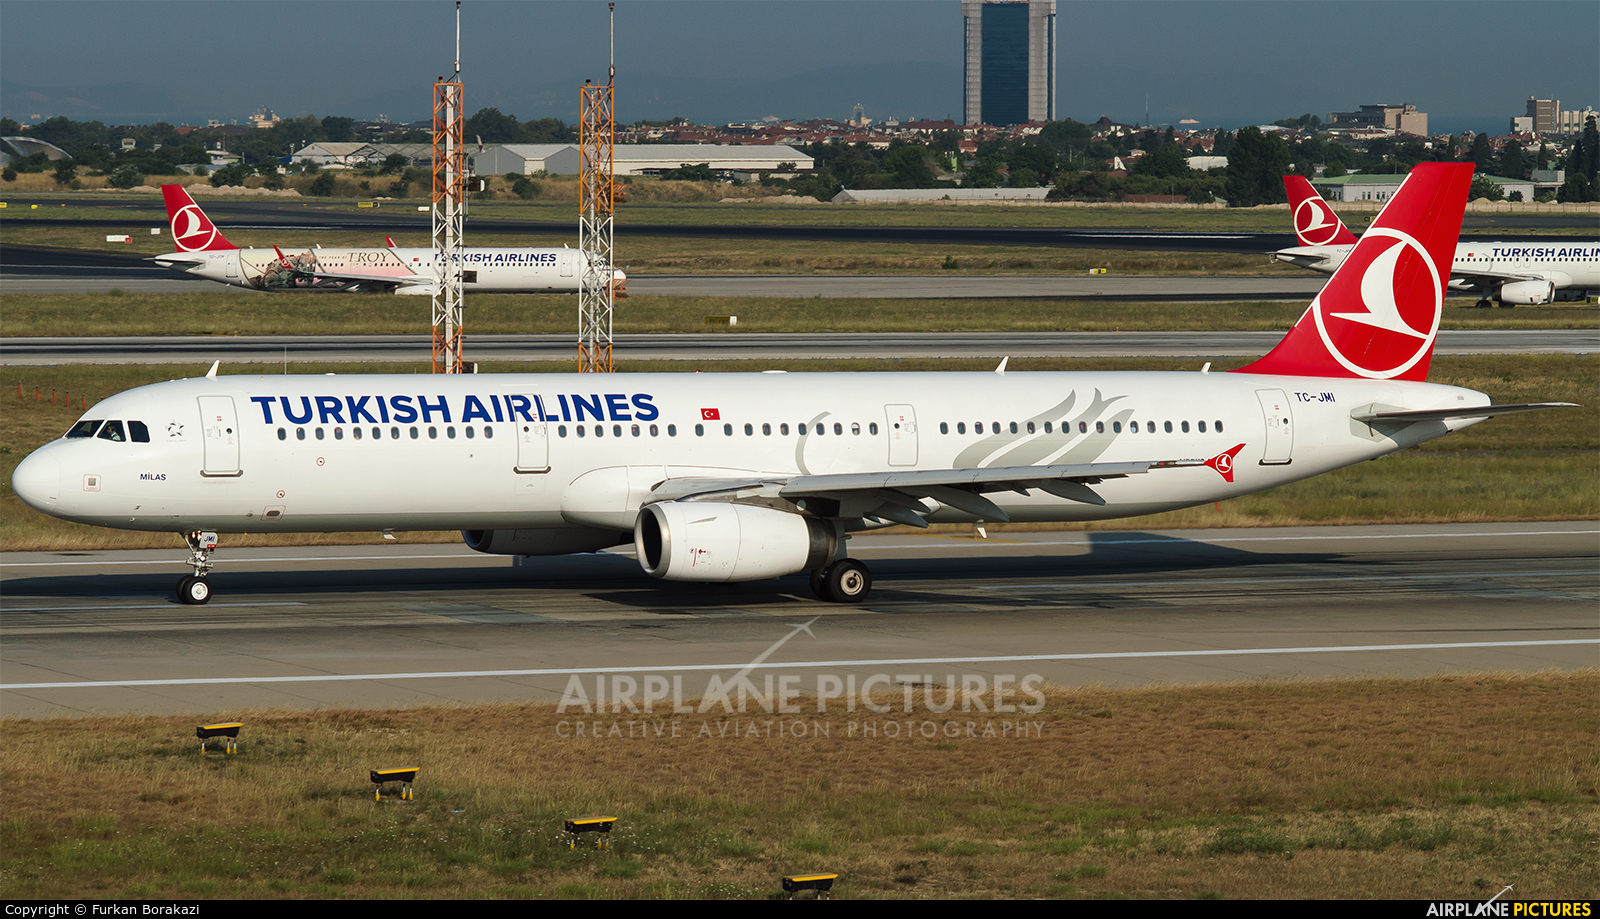 Turkish Airlines TC-JMI aircraft at Istanbul - Ataturk